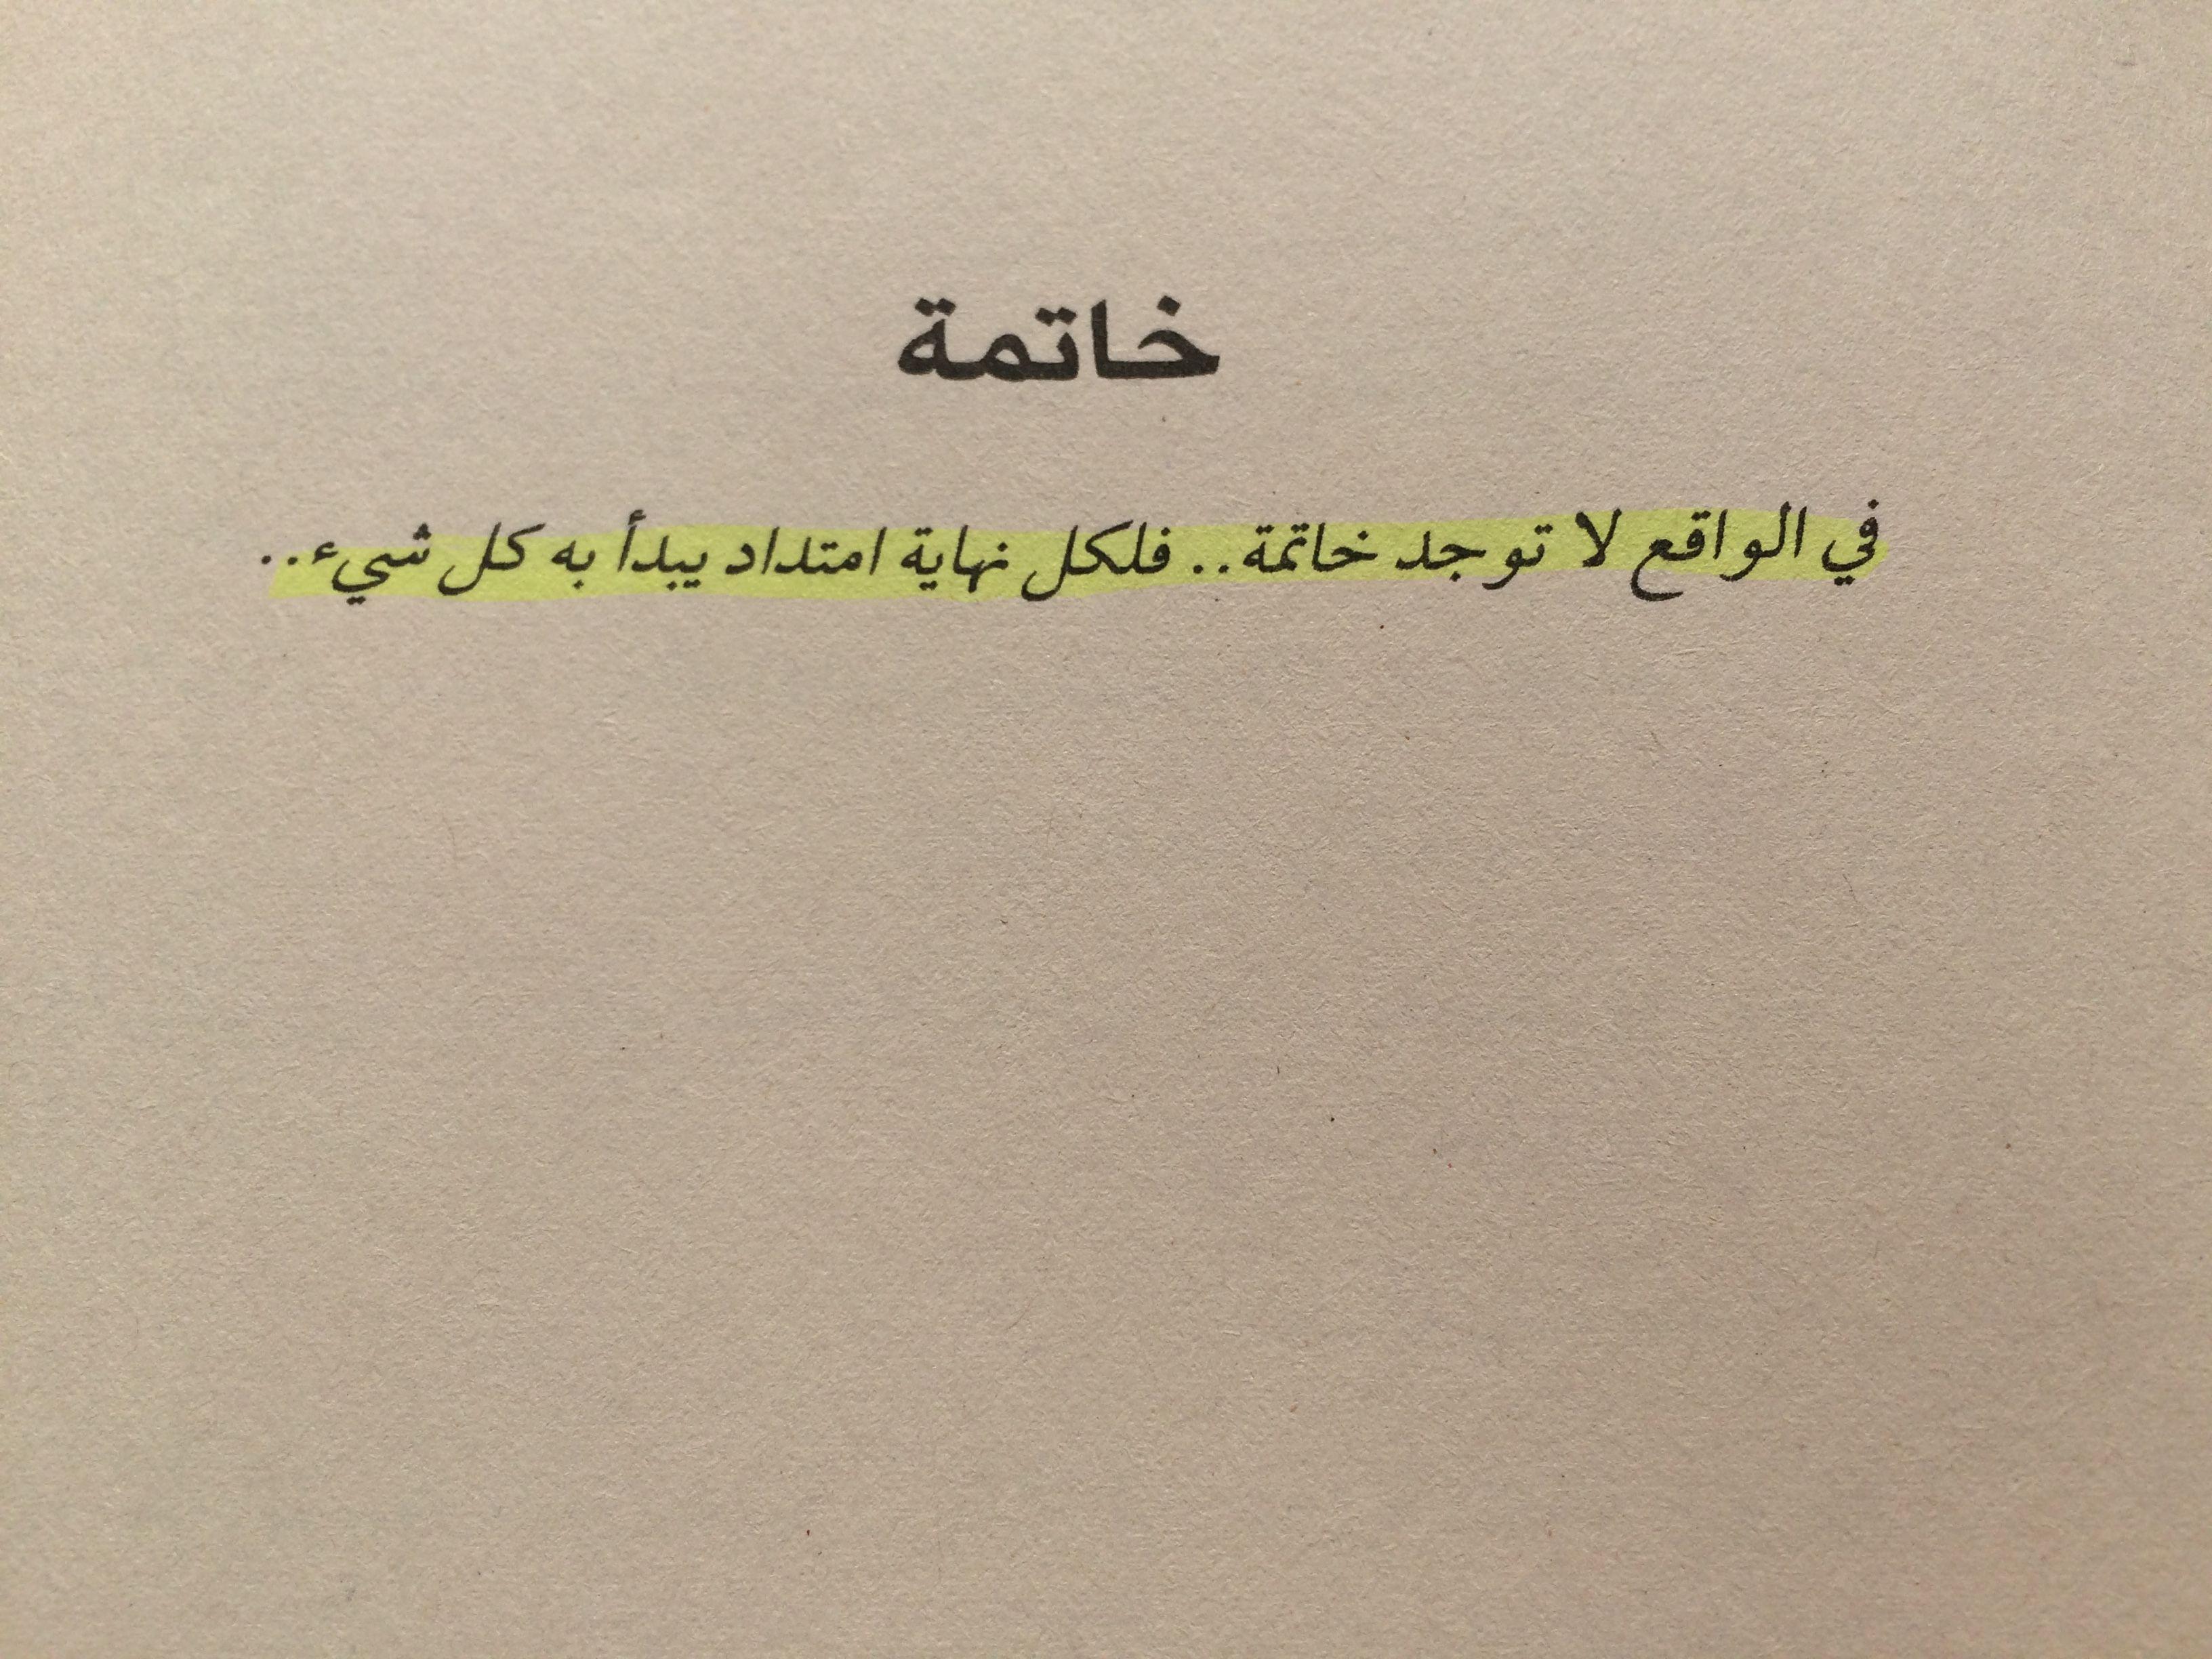 من رواية هيبتا محم د صادق Words Quotes Favorite Book Quotes Book Quotes